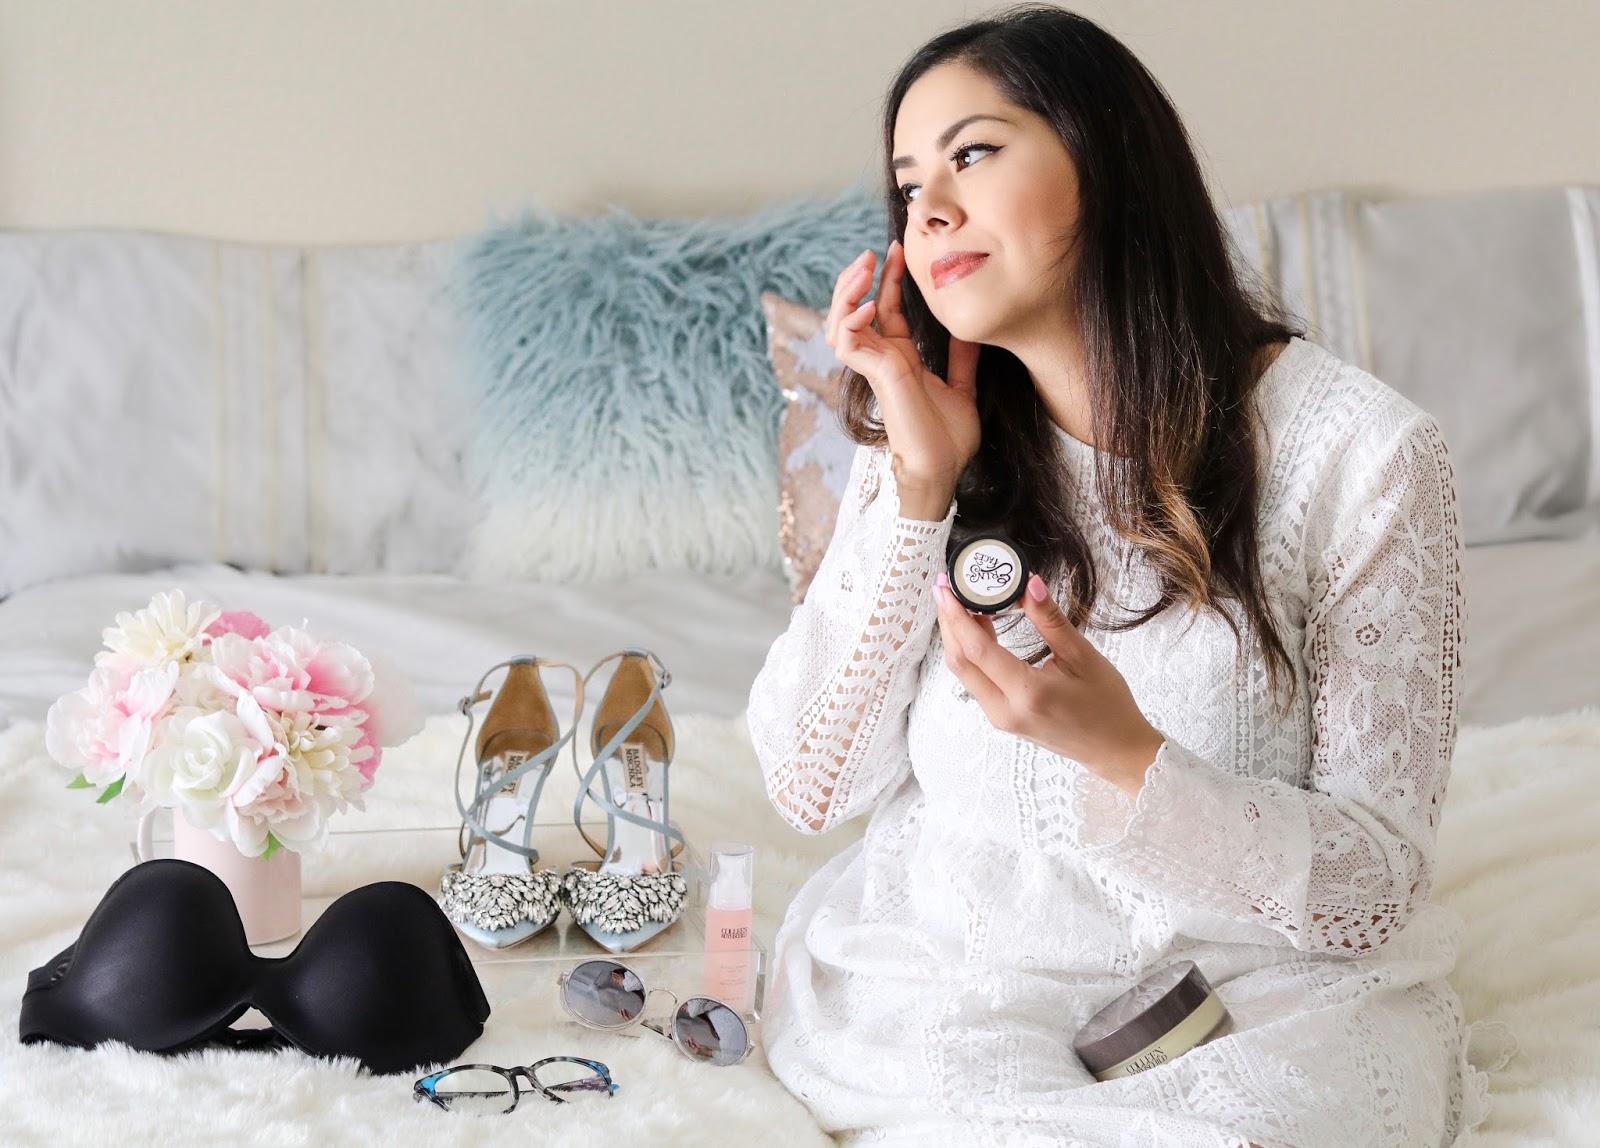 Erin's Faces Magic Dust blogger, babbleboxx blogger